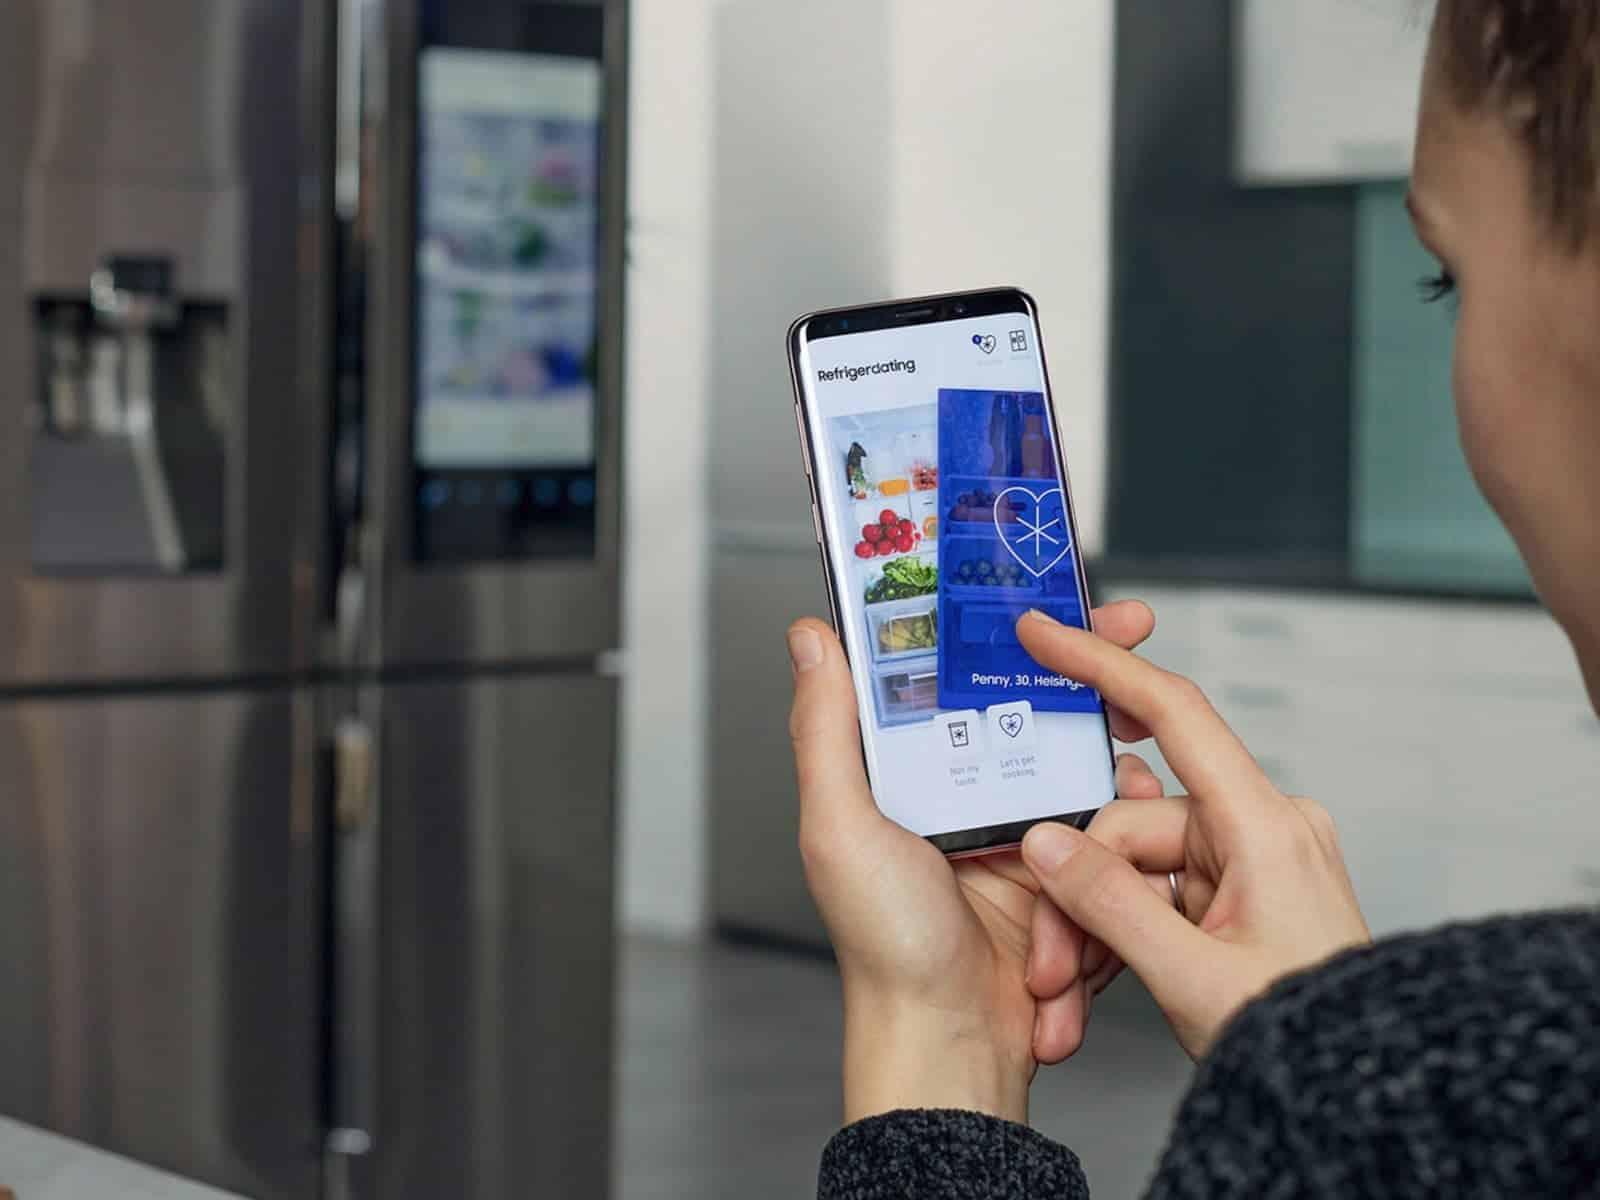 Refrigerdating img from Samsung